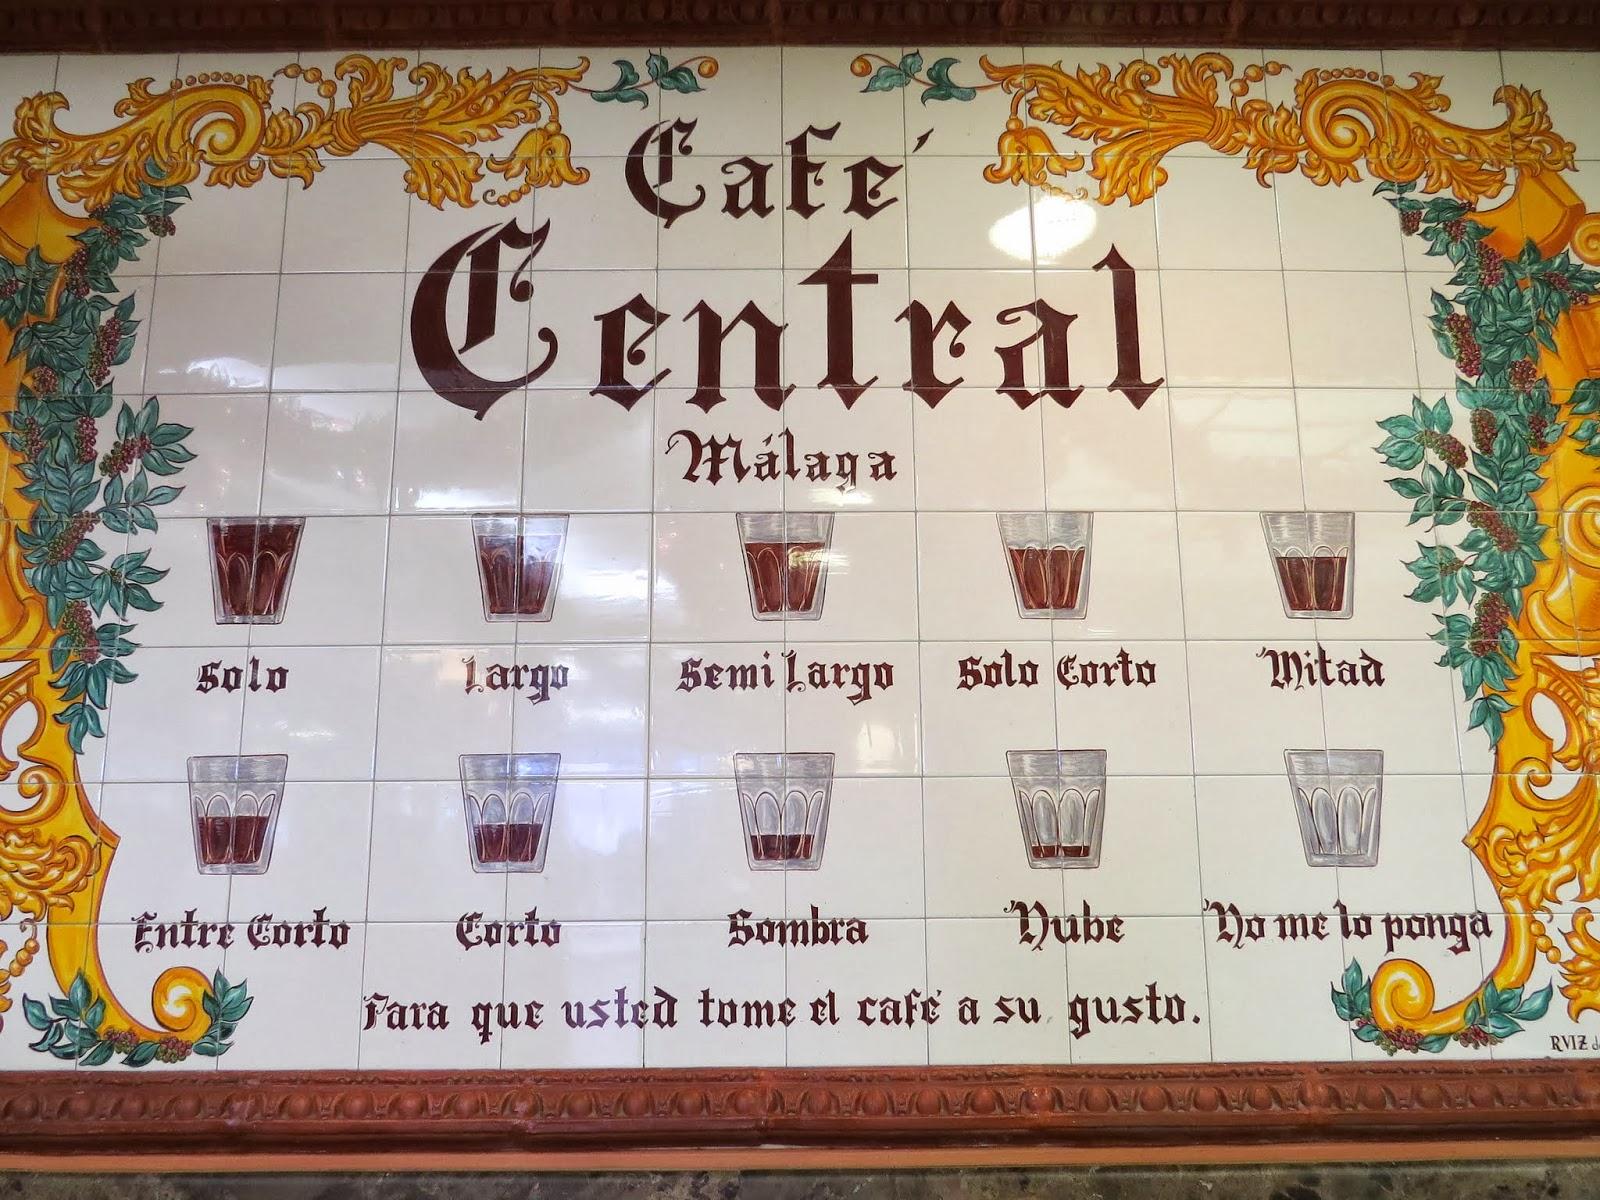 Cafe Central Coffee Menu in Málaga, Spain